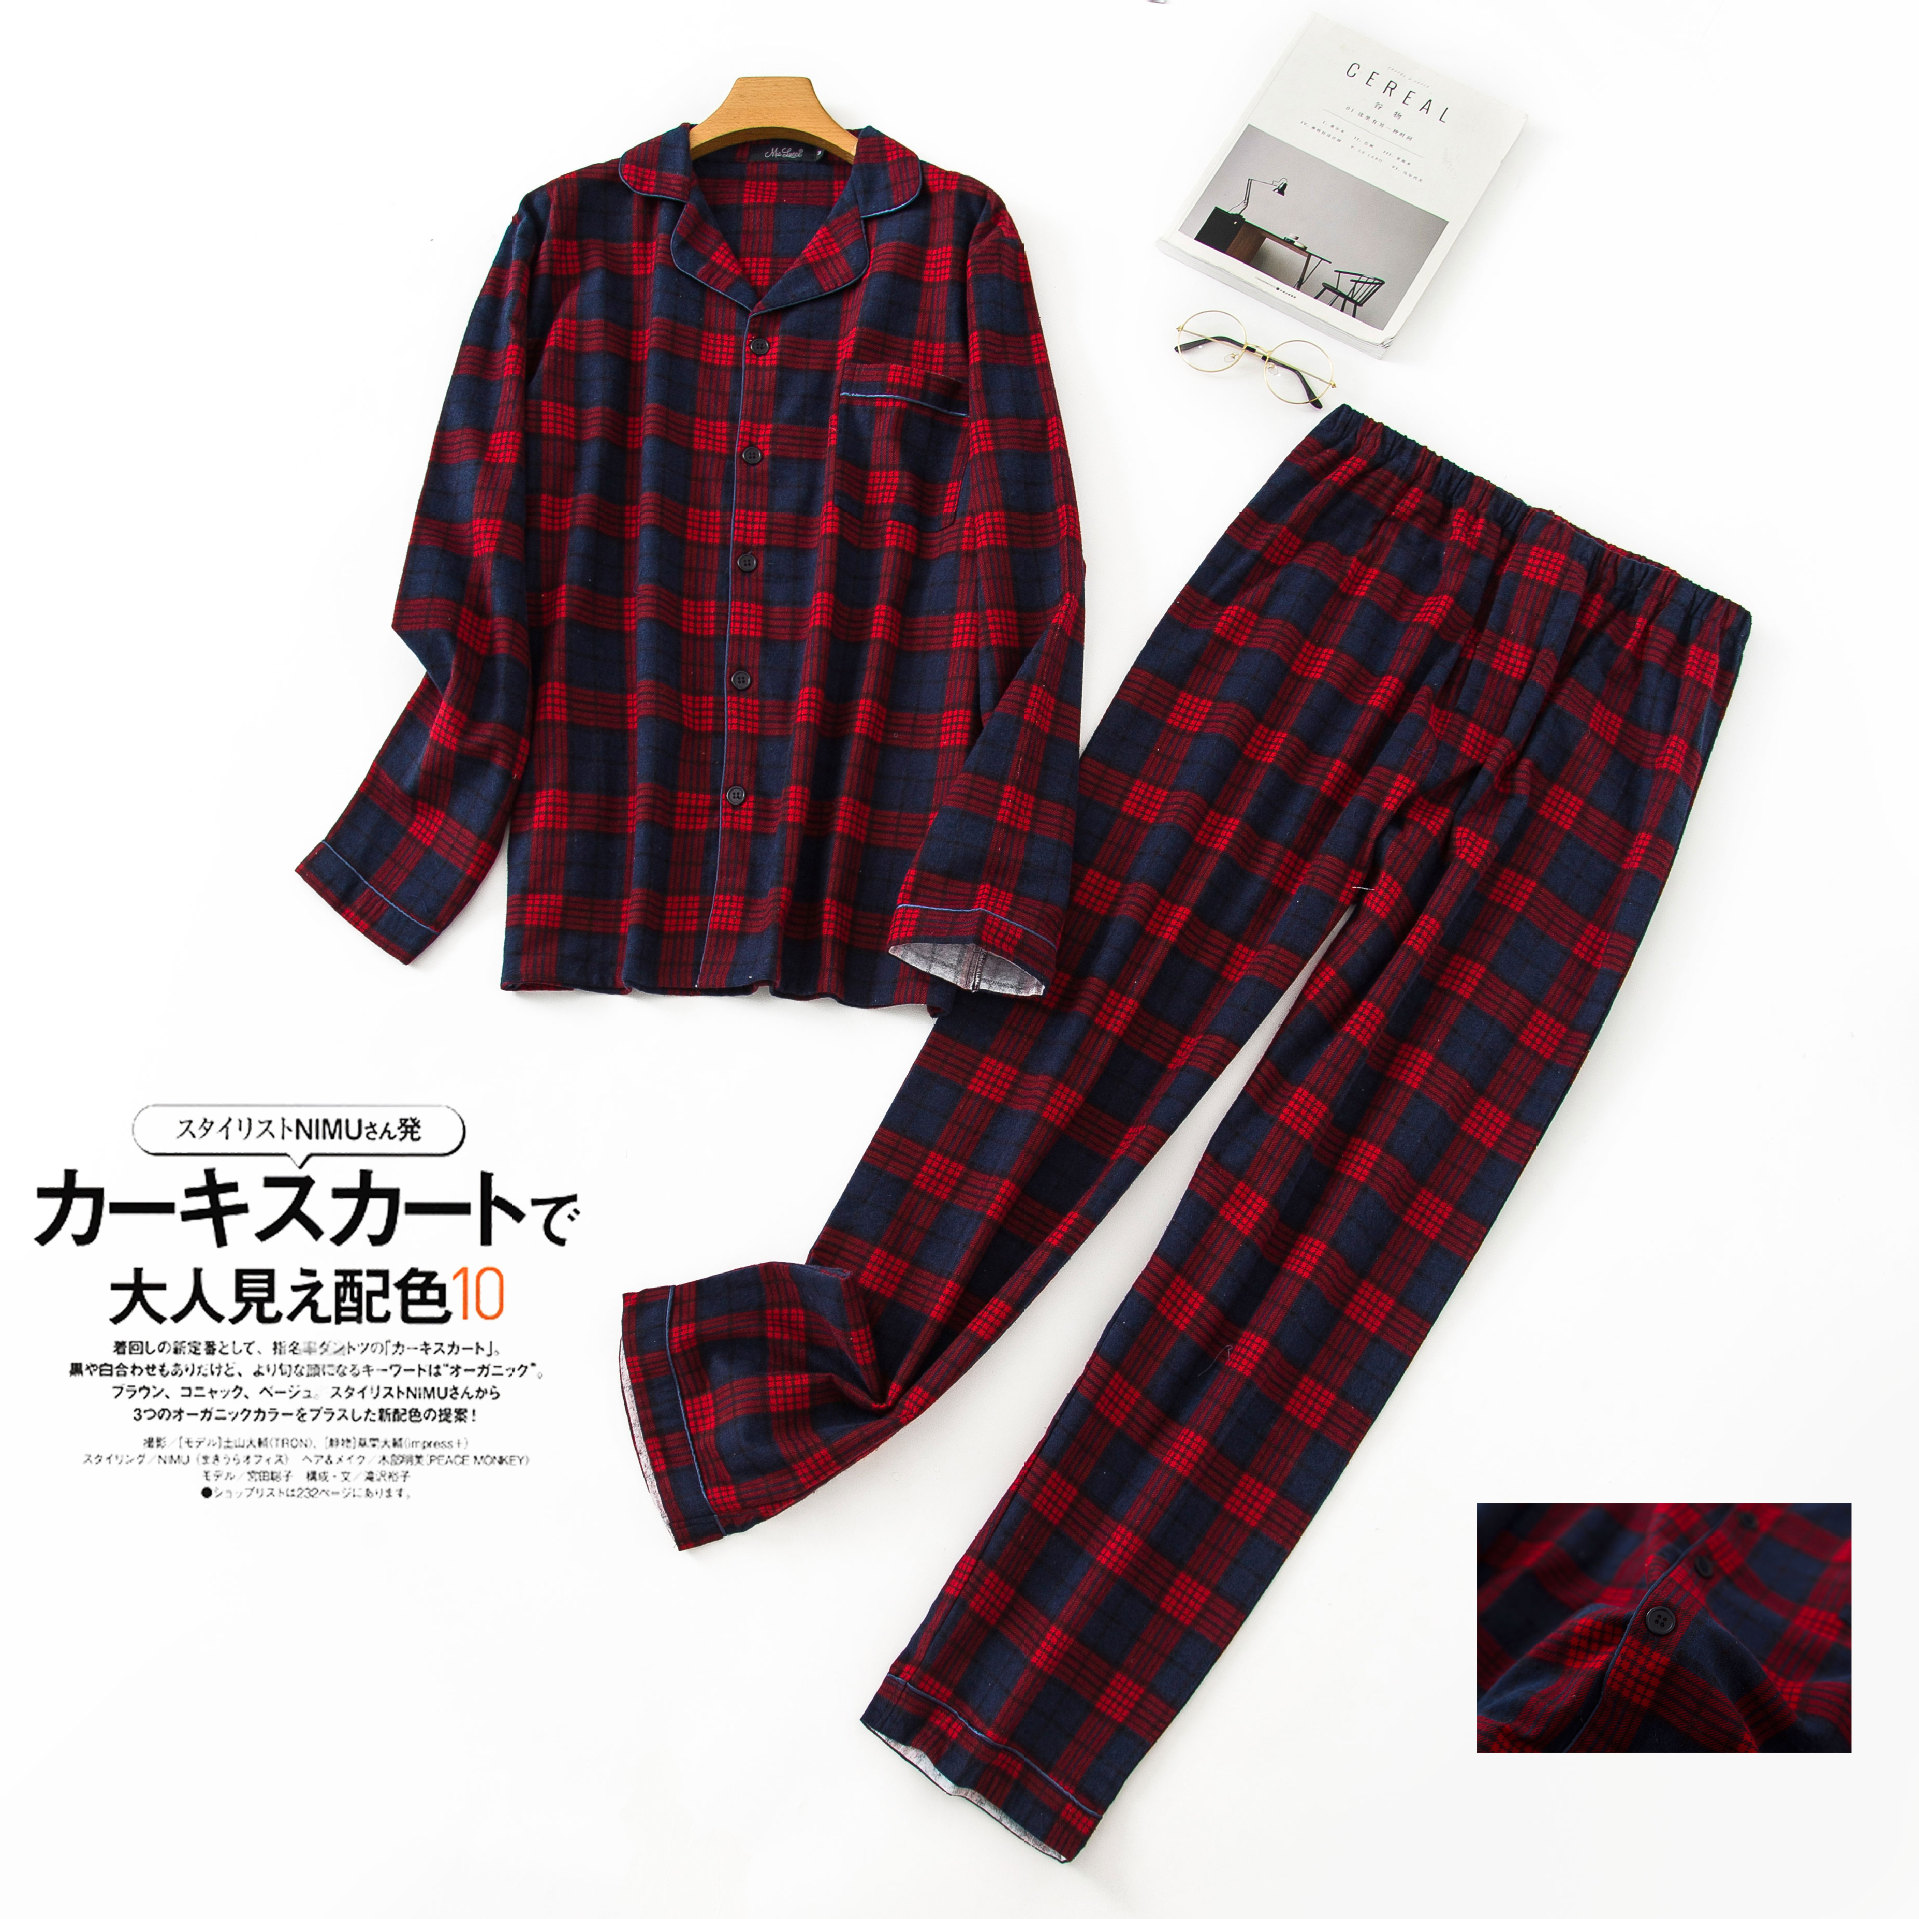 New Cotton Mens Winter Plaid Long Sleeve Pants Flannelette Pajamas Set Men Sleepwear Keep Warm Flannel Nightgown Couple Set